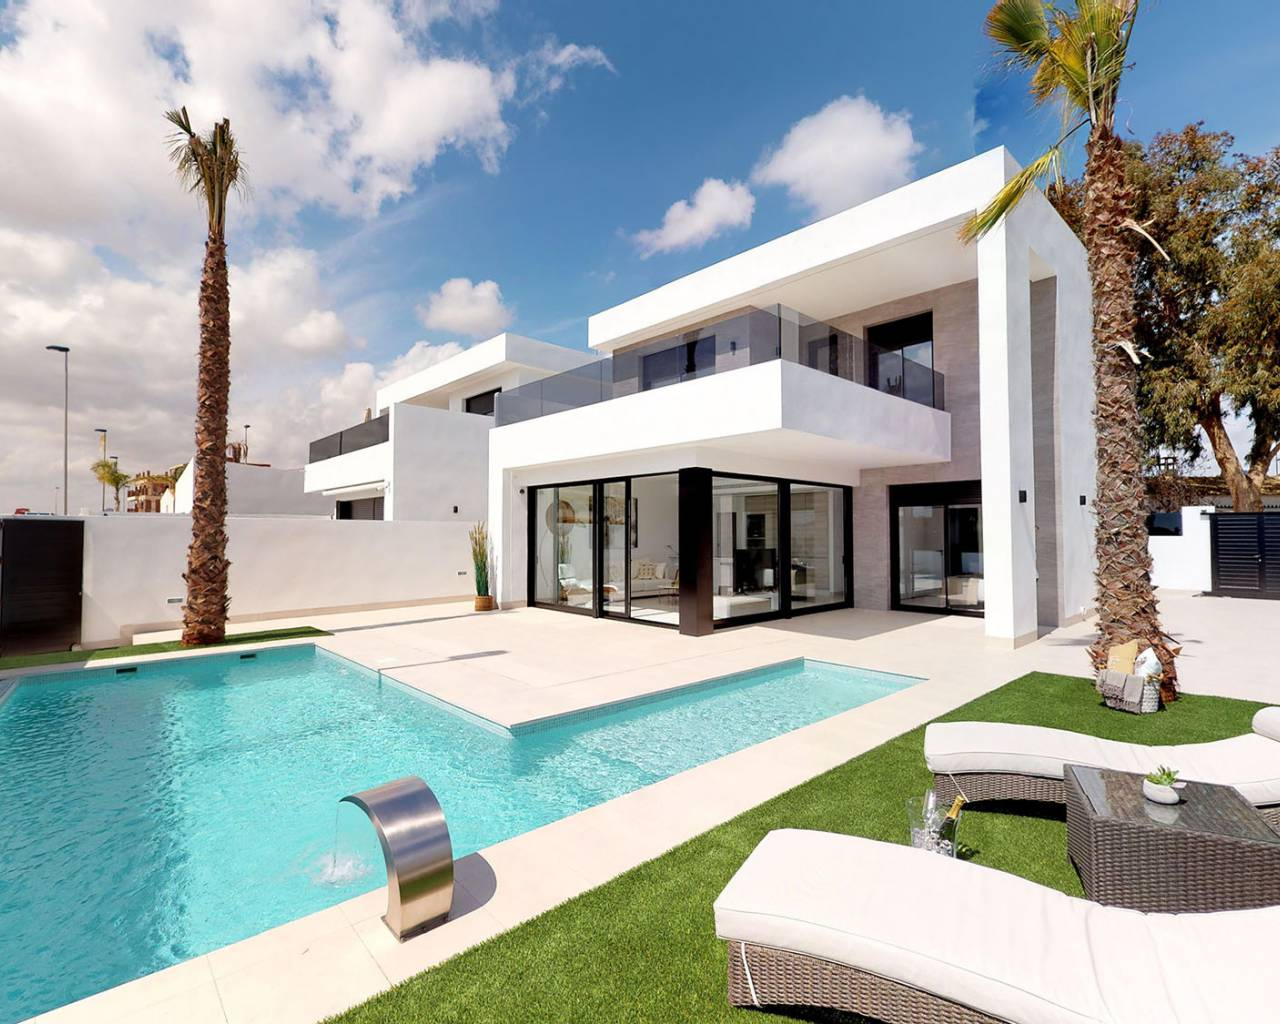 nieuwbouw-vrijstaande-villa-sucina-centro_2728_xl